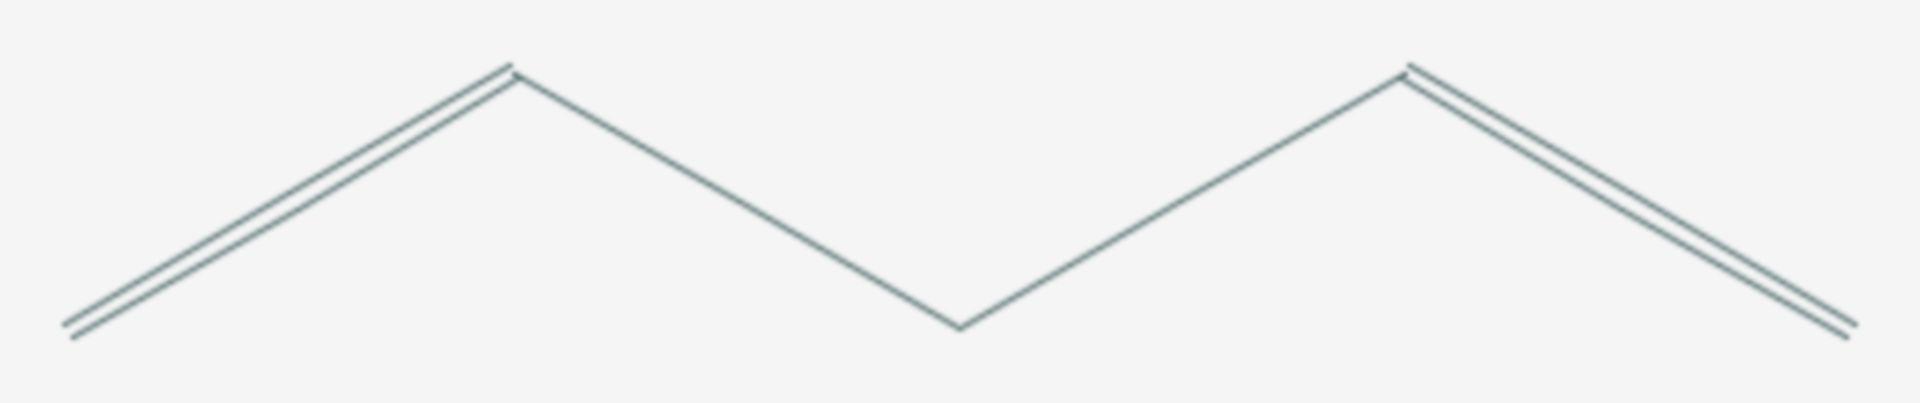 1,4-Pentadien (Strukturformel)